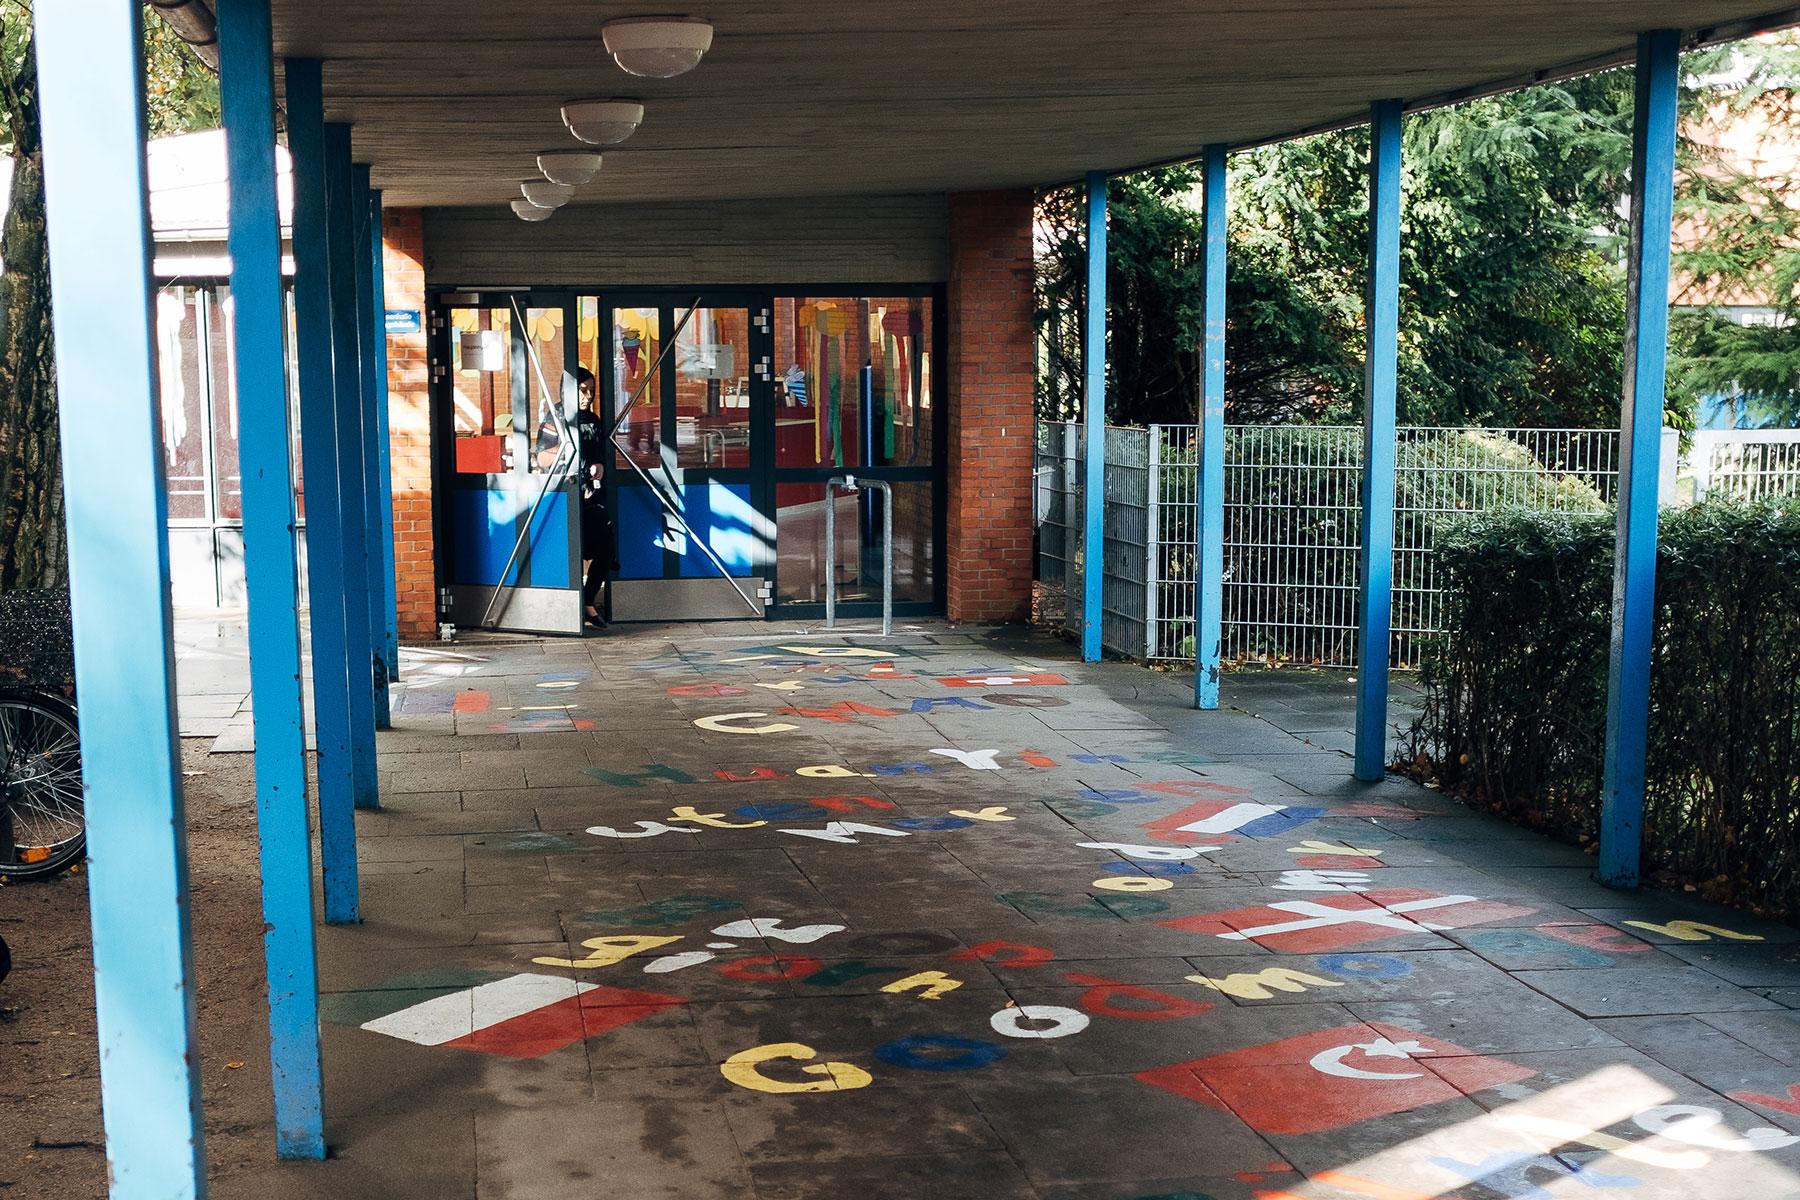 CARL-GOETZE-SCHULE-unsere-schule-rundgang